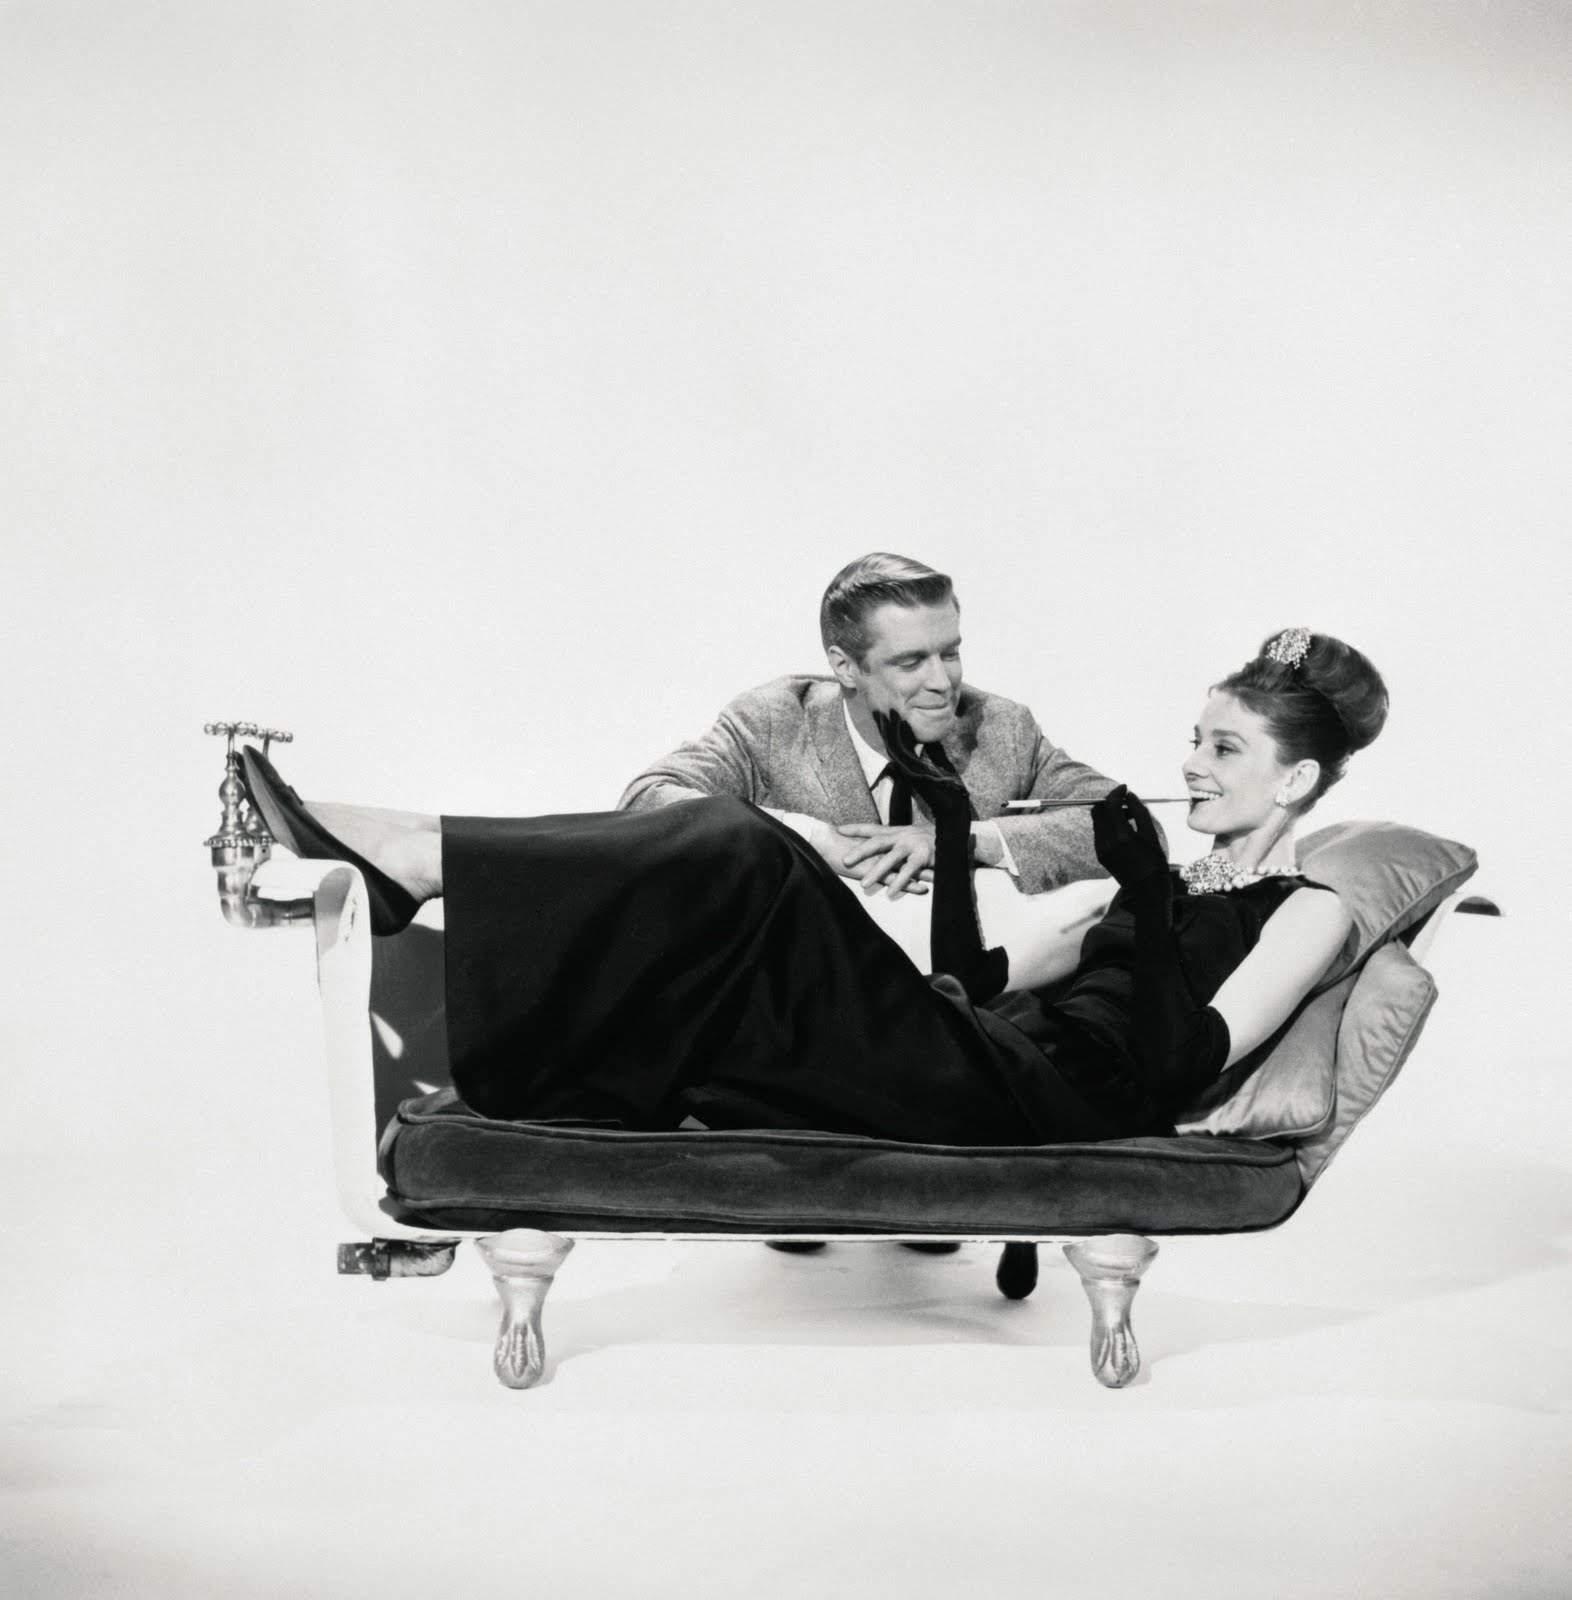 Audrey Hepburn Breakfast at Tiffany's Movie Scenes